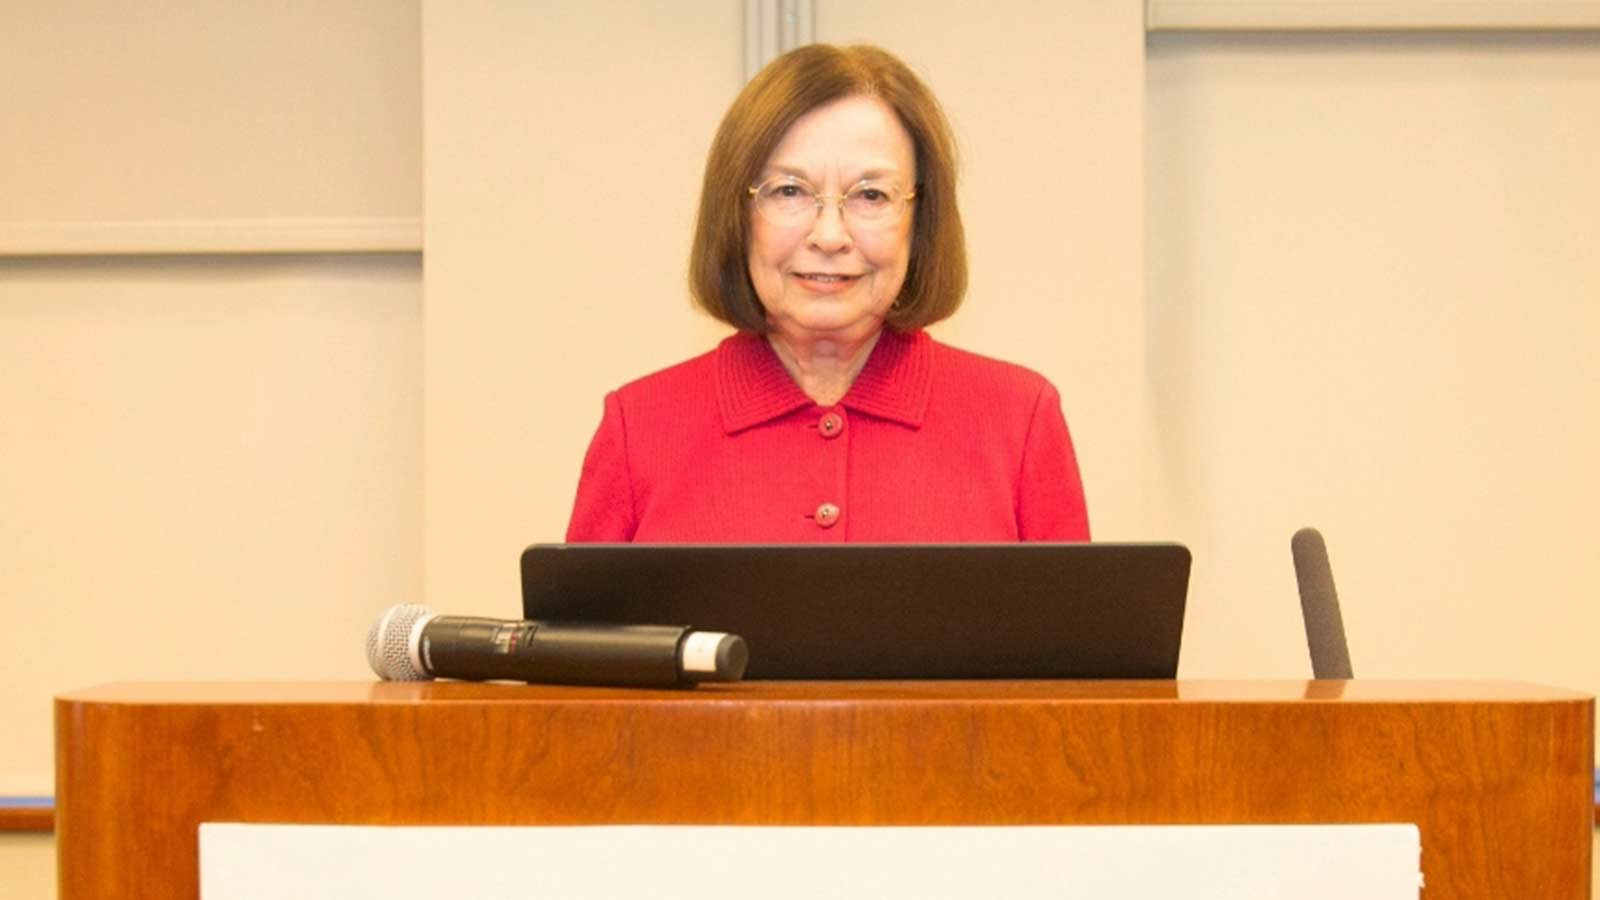 Gail McCain from the School of Nursing